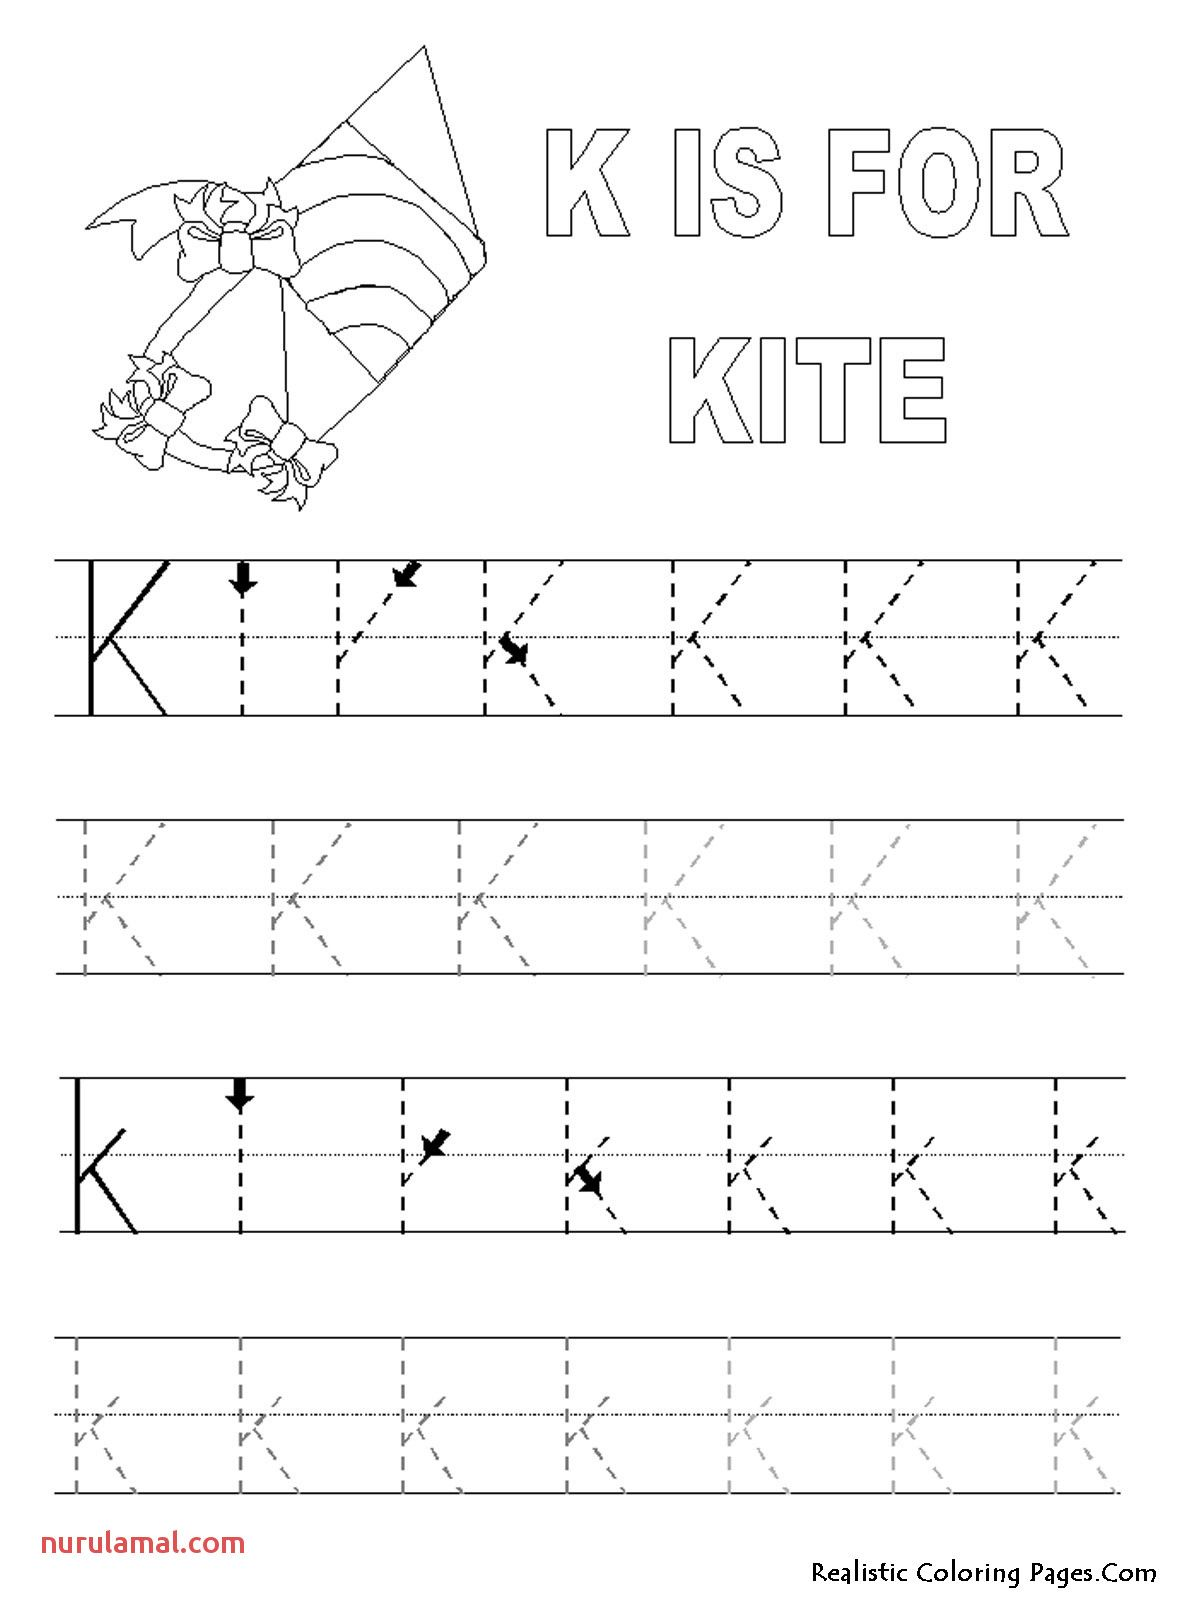 Alphabet Worksheets Preschool Coloring Pages In 2020 Alphabet Tracing Printables Alphabet Tracing Worksheets Tracing Worksheets Preschool